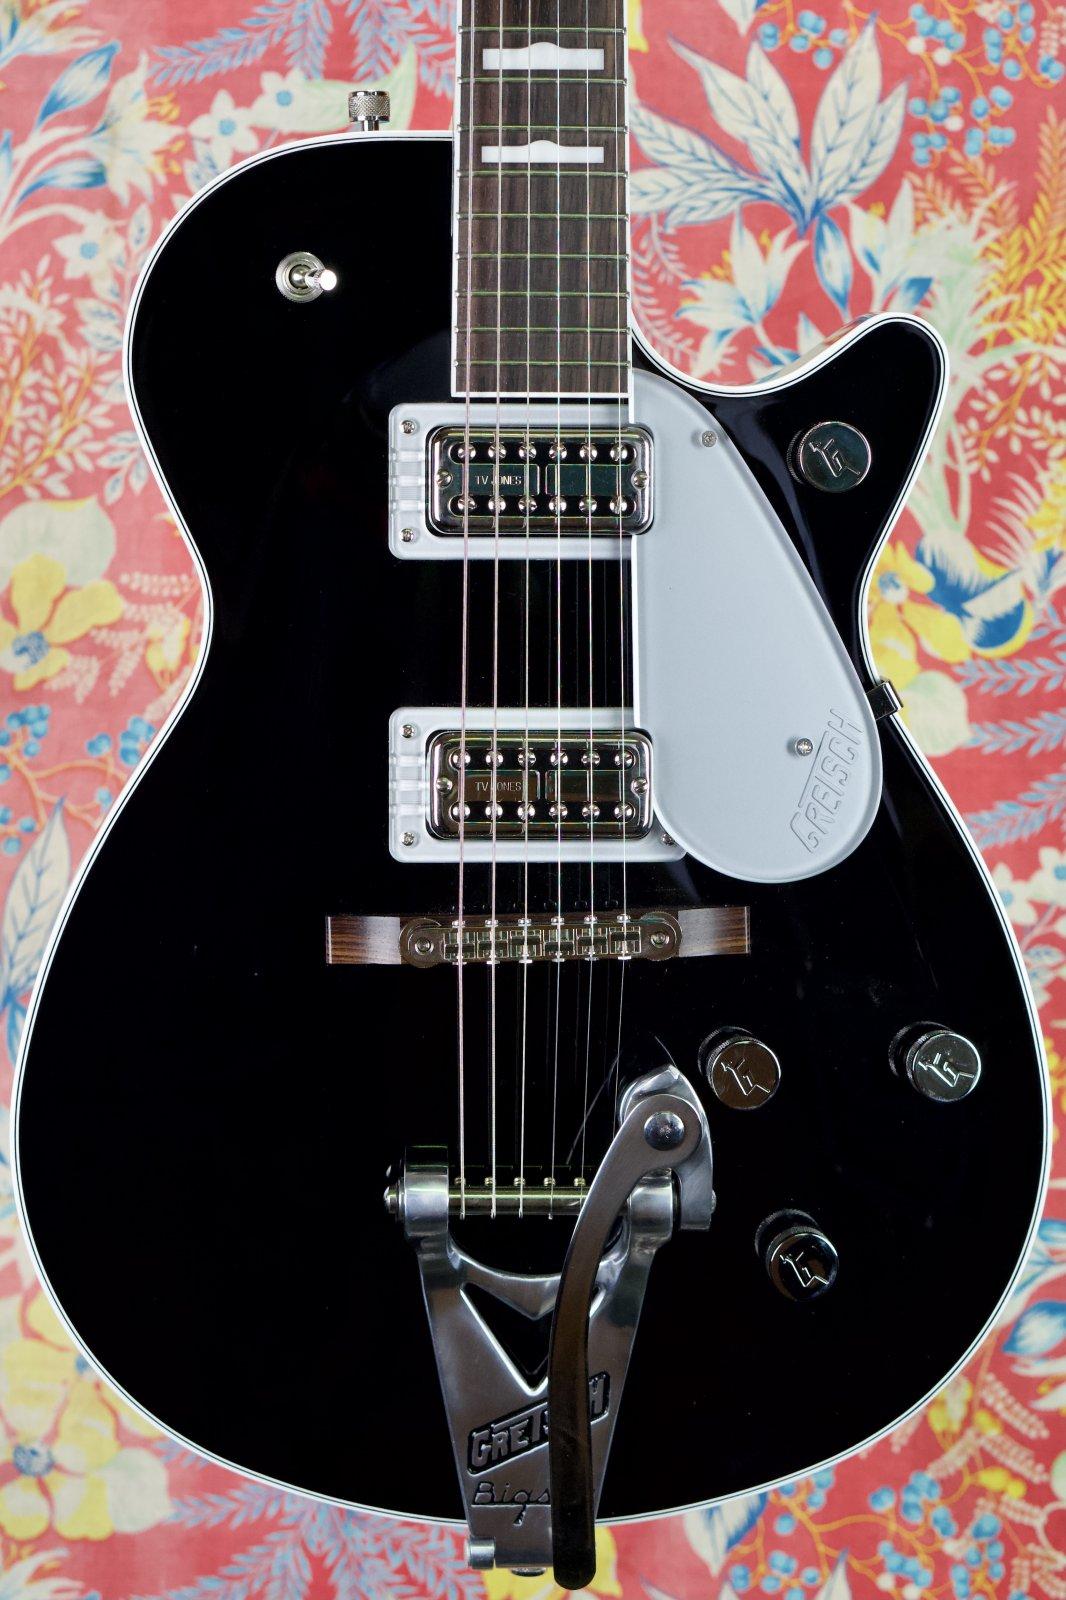 2021 Gretsch G6128T-89 Vintage Select '89 Duo-Jet Black